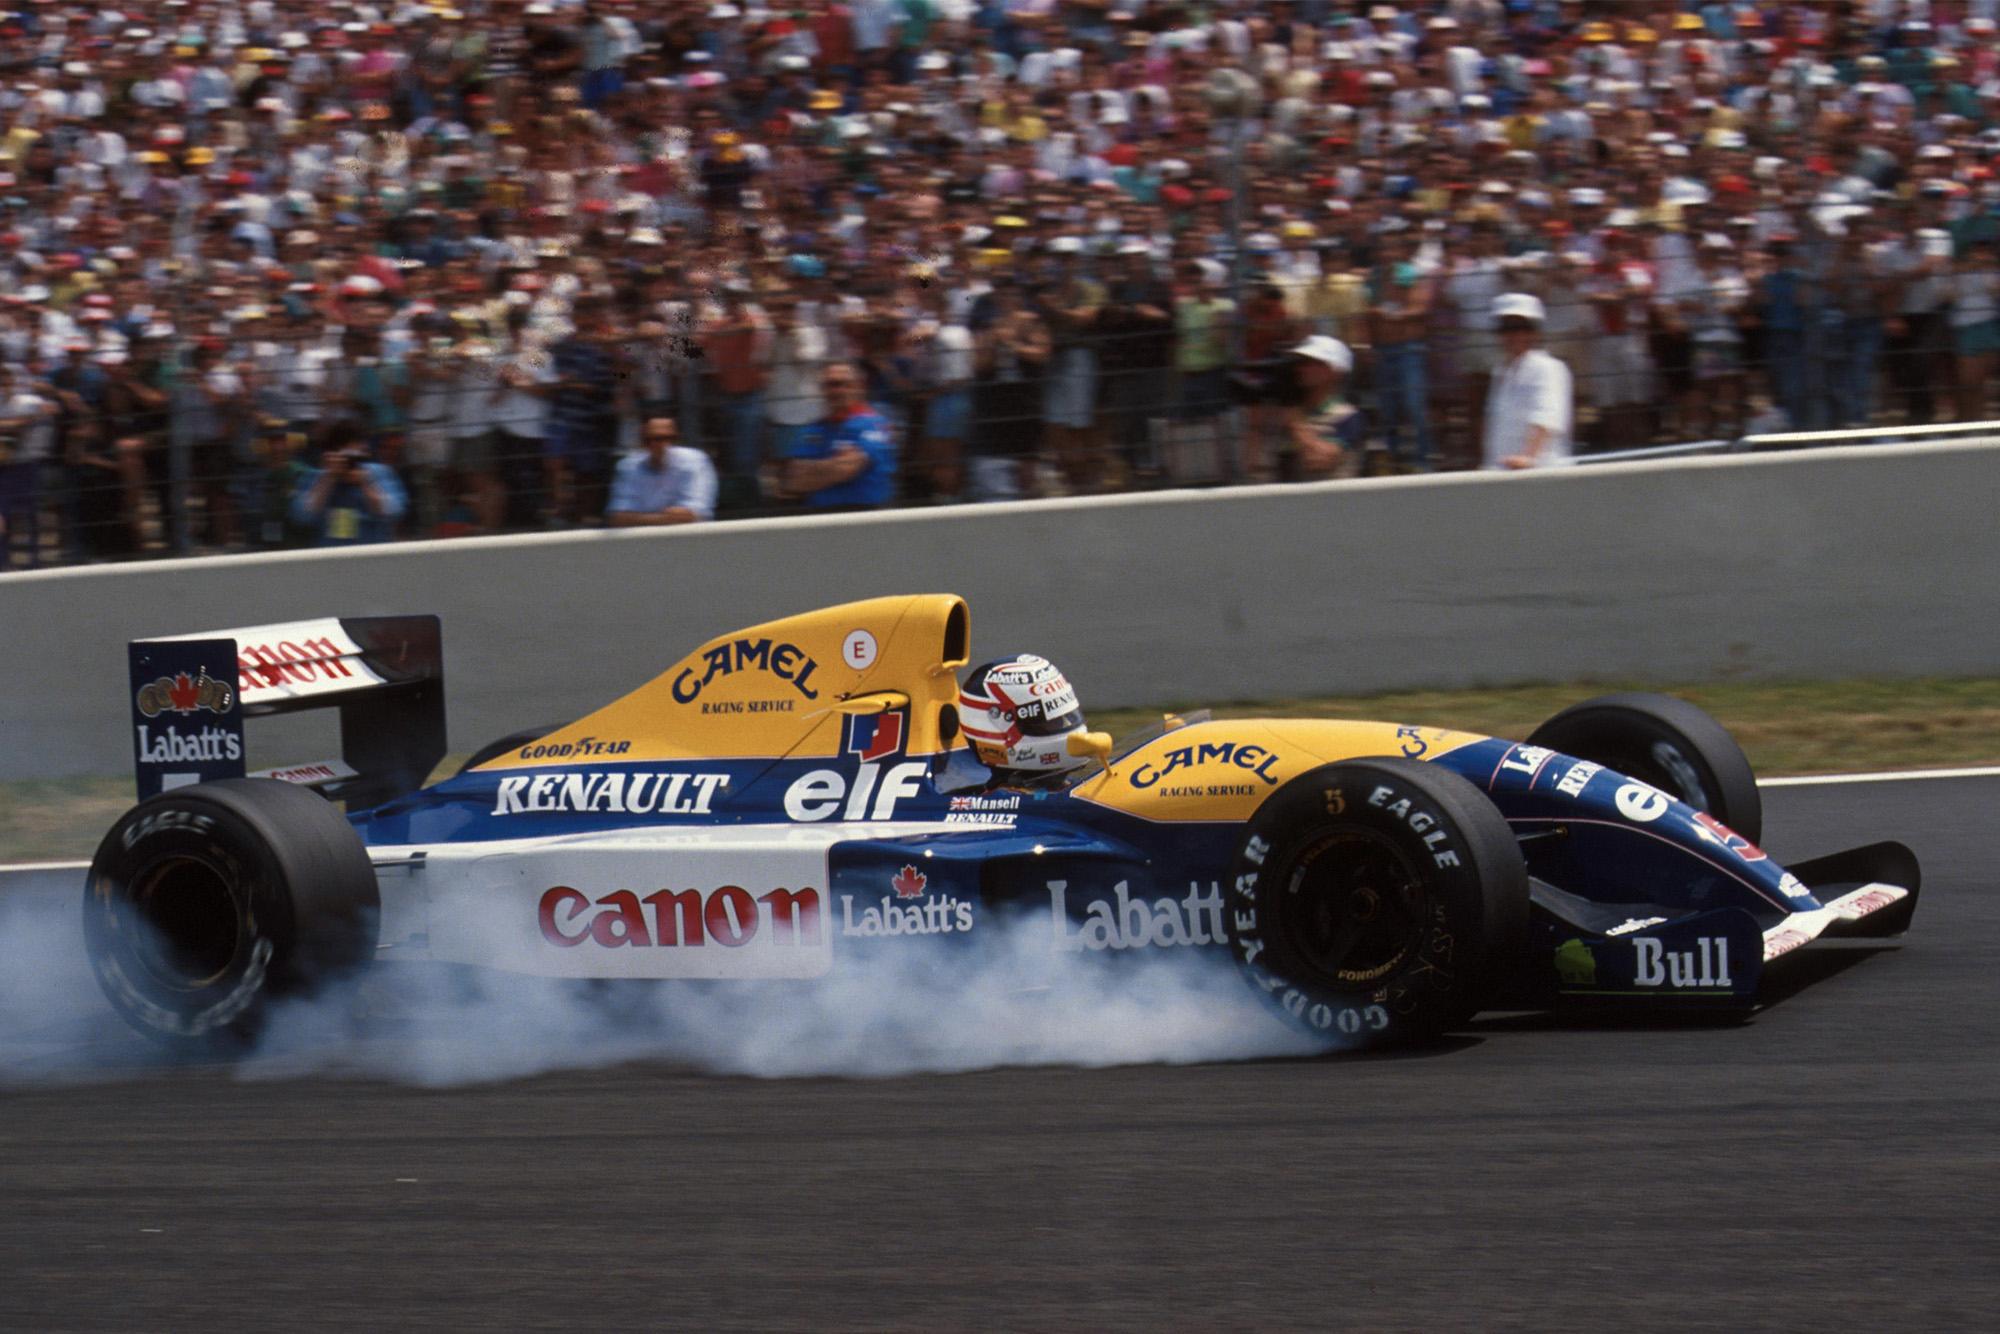 Manselllockup